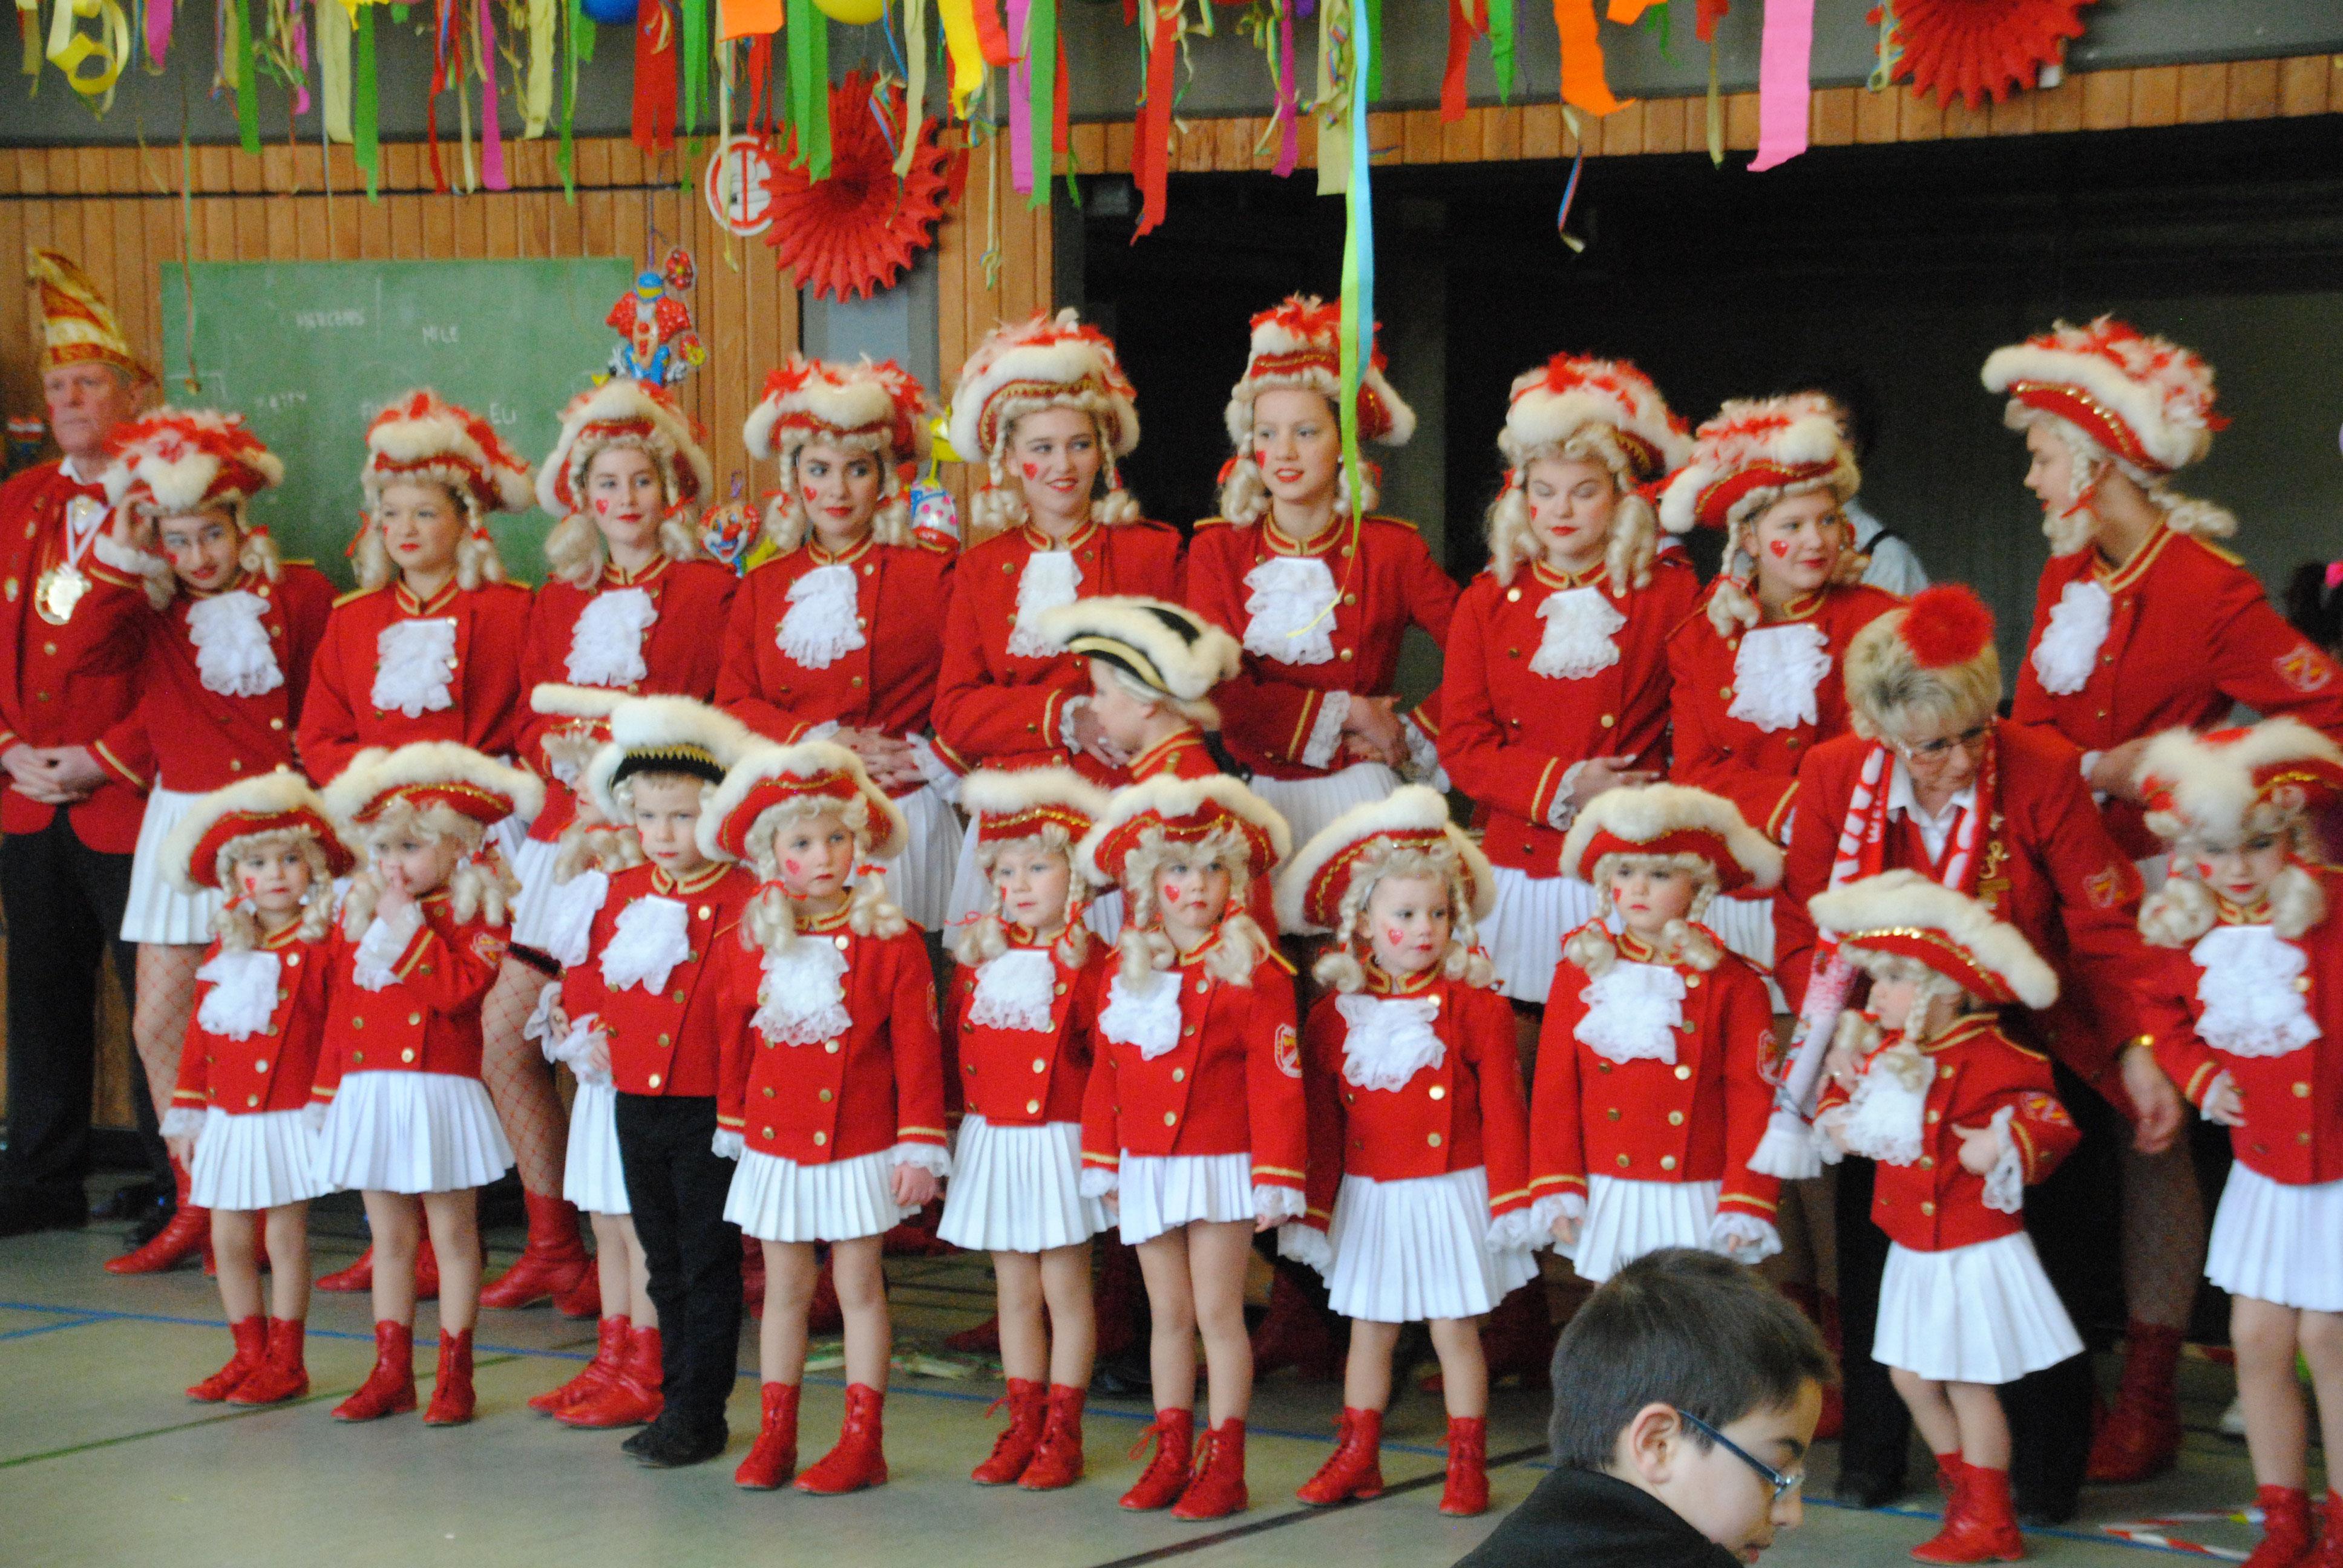 Weiberkarneval - Emilie-Heyermann-Schule